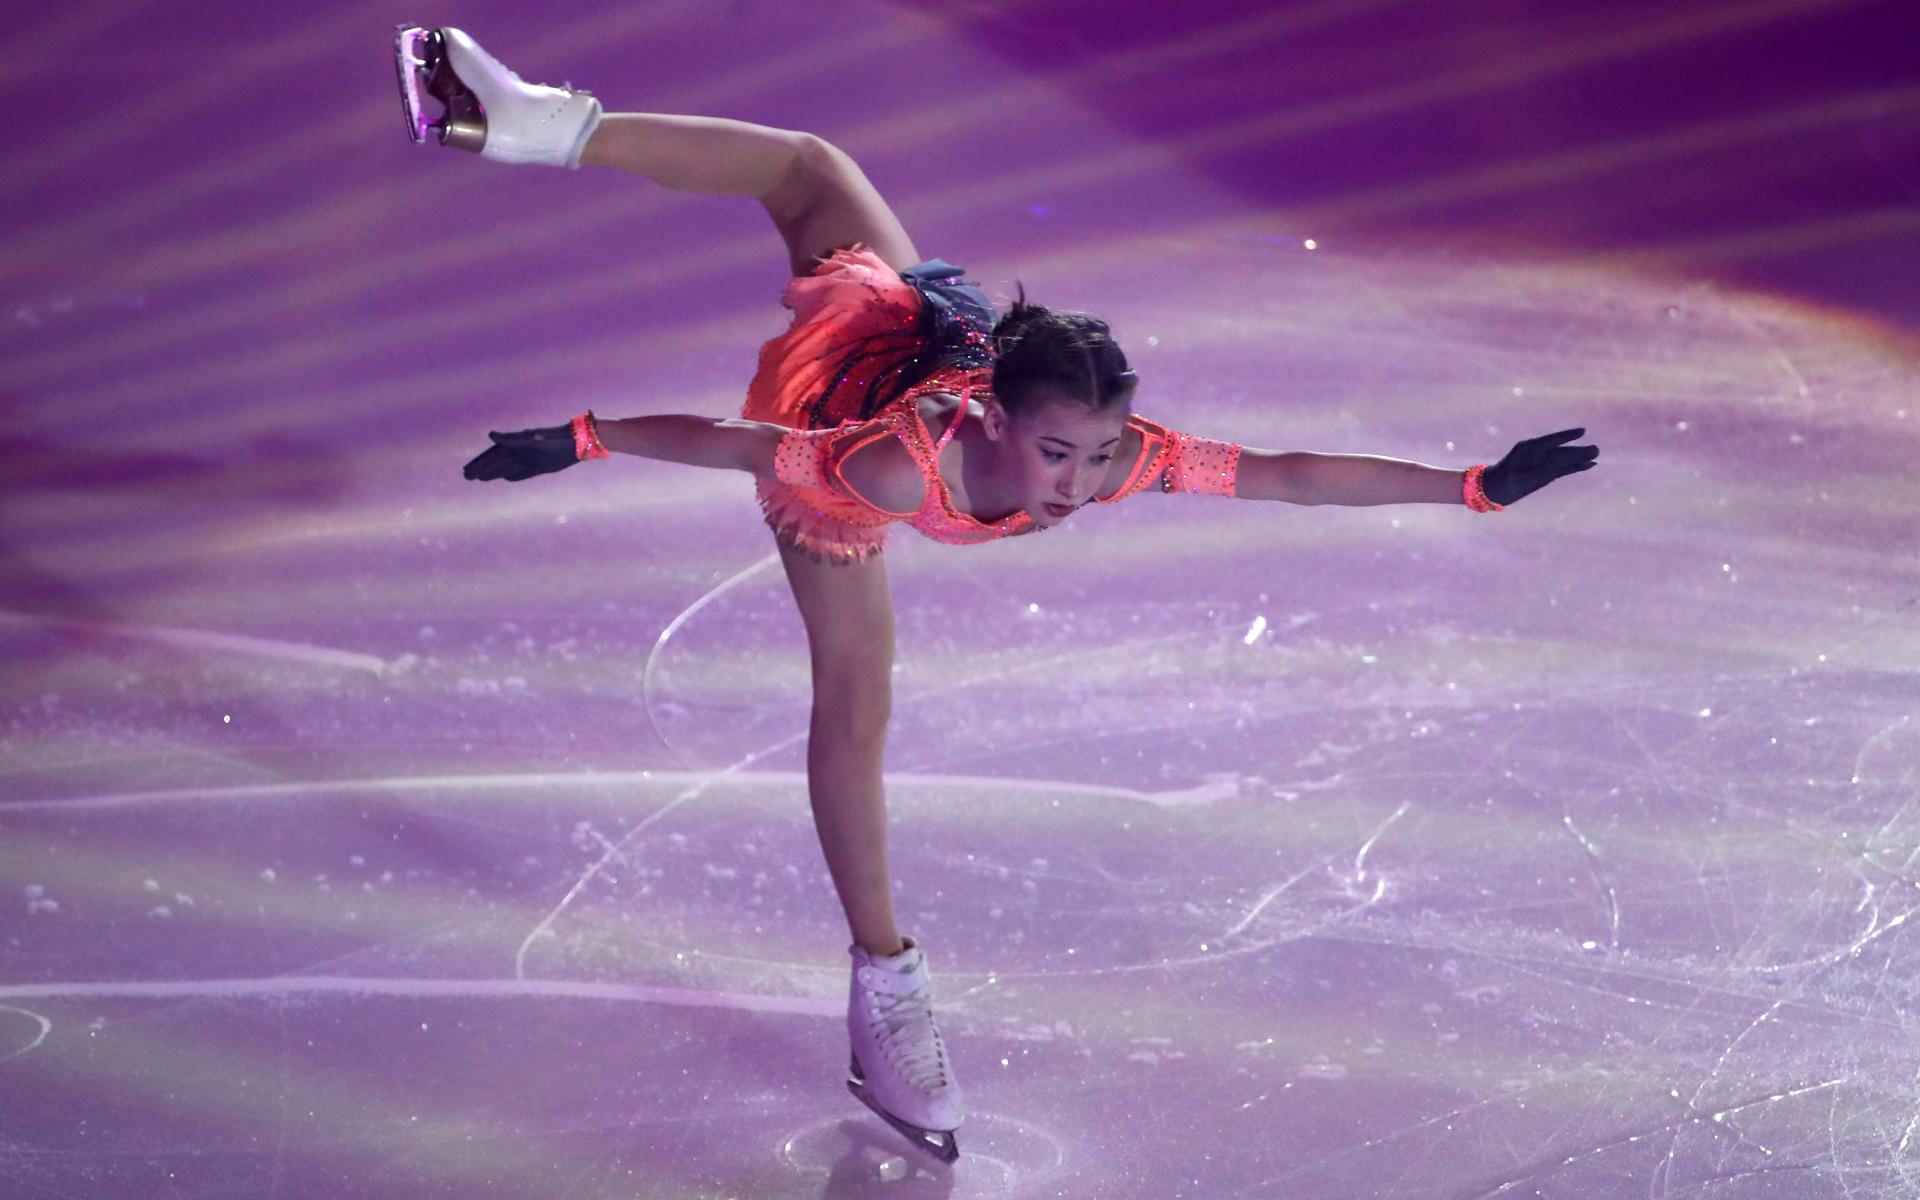 Фото: Александр Демьянчук/ТАСС